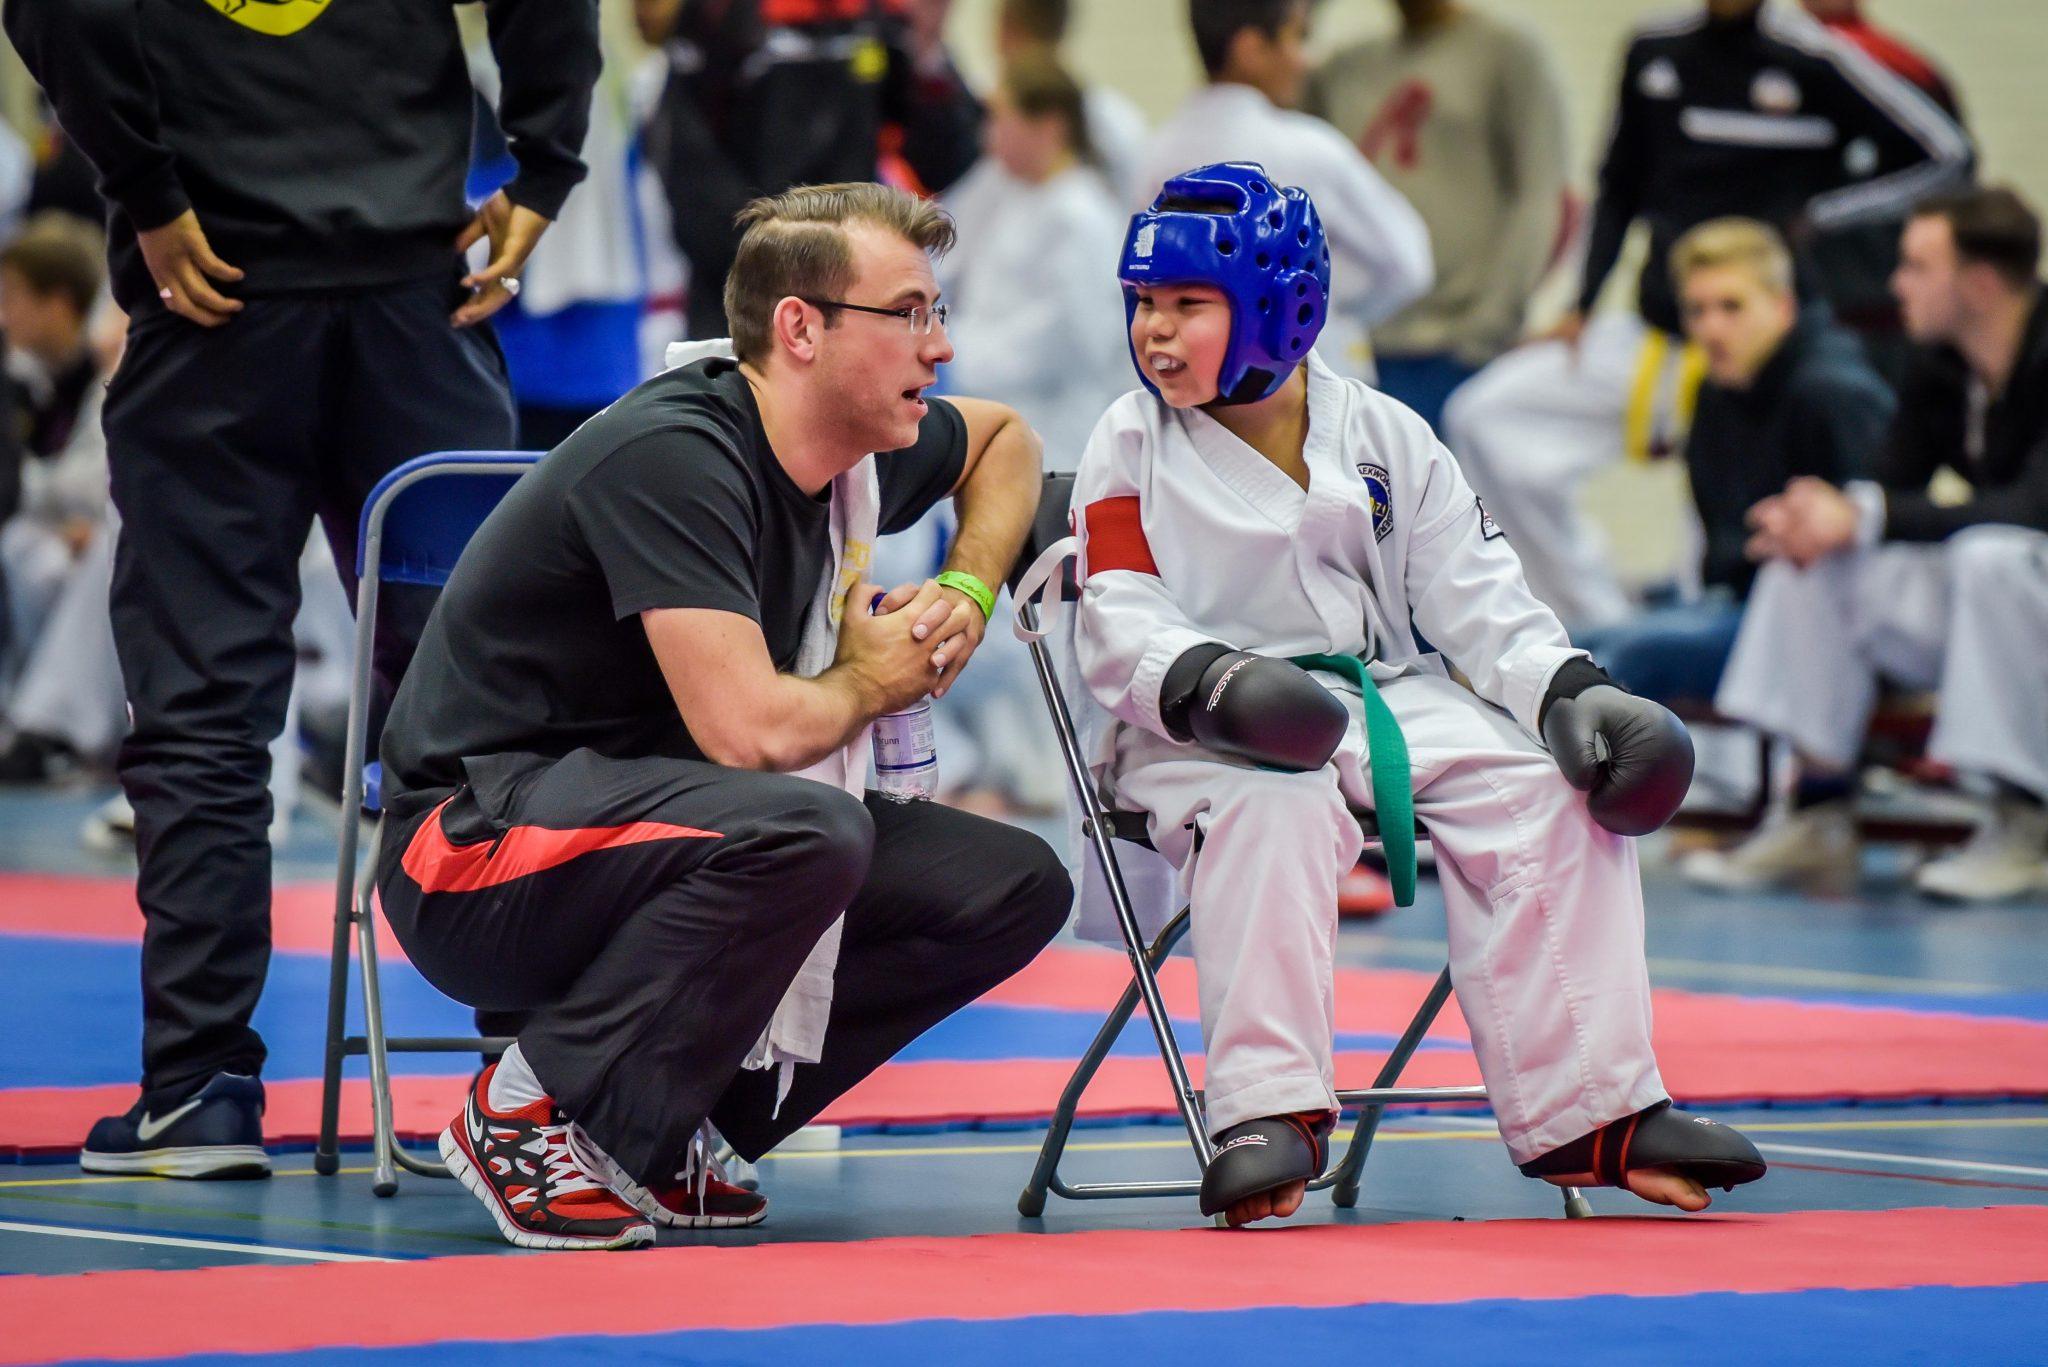 Sportvrijwilliger Rory de Vries